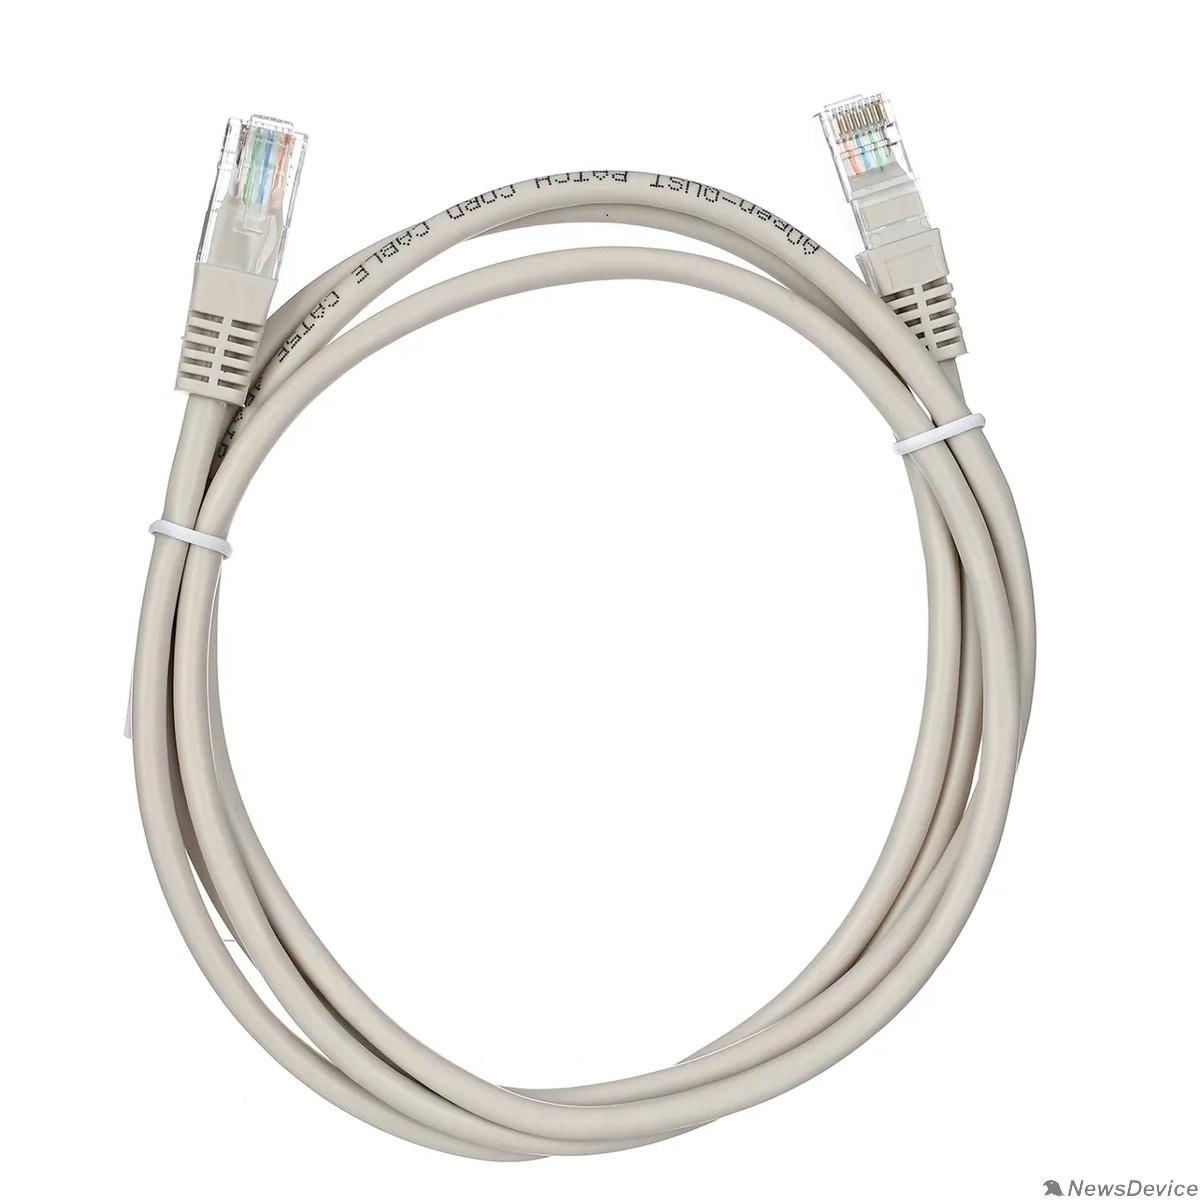 Коммутационный шнур Aopen Патч-корд UTP кат.5е 1.5м серый ANP511_1.5M (6938510884411)